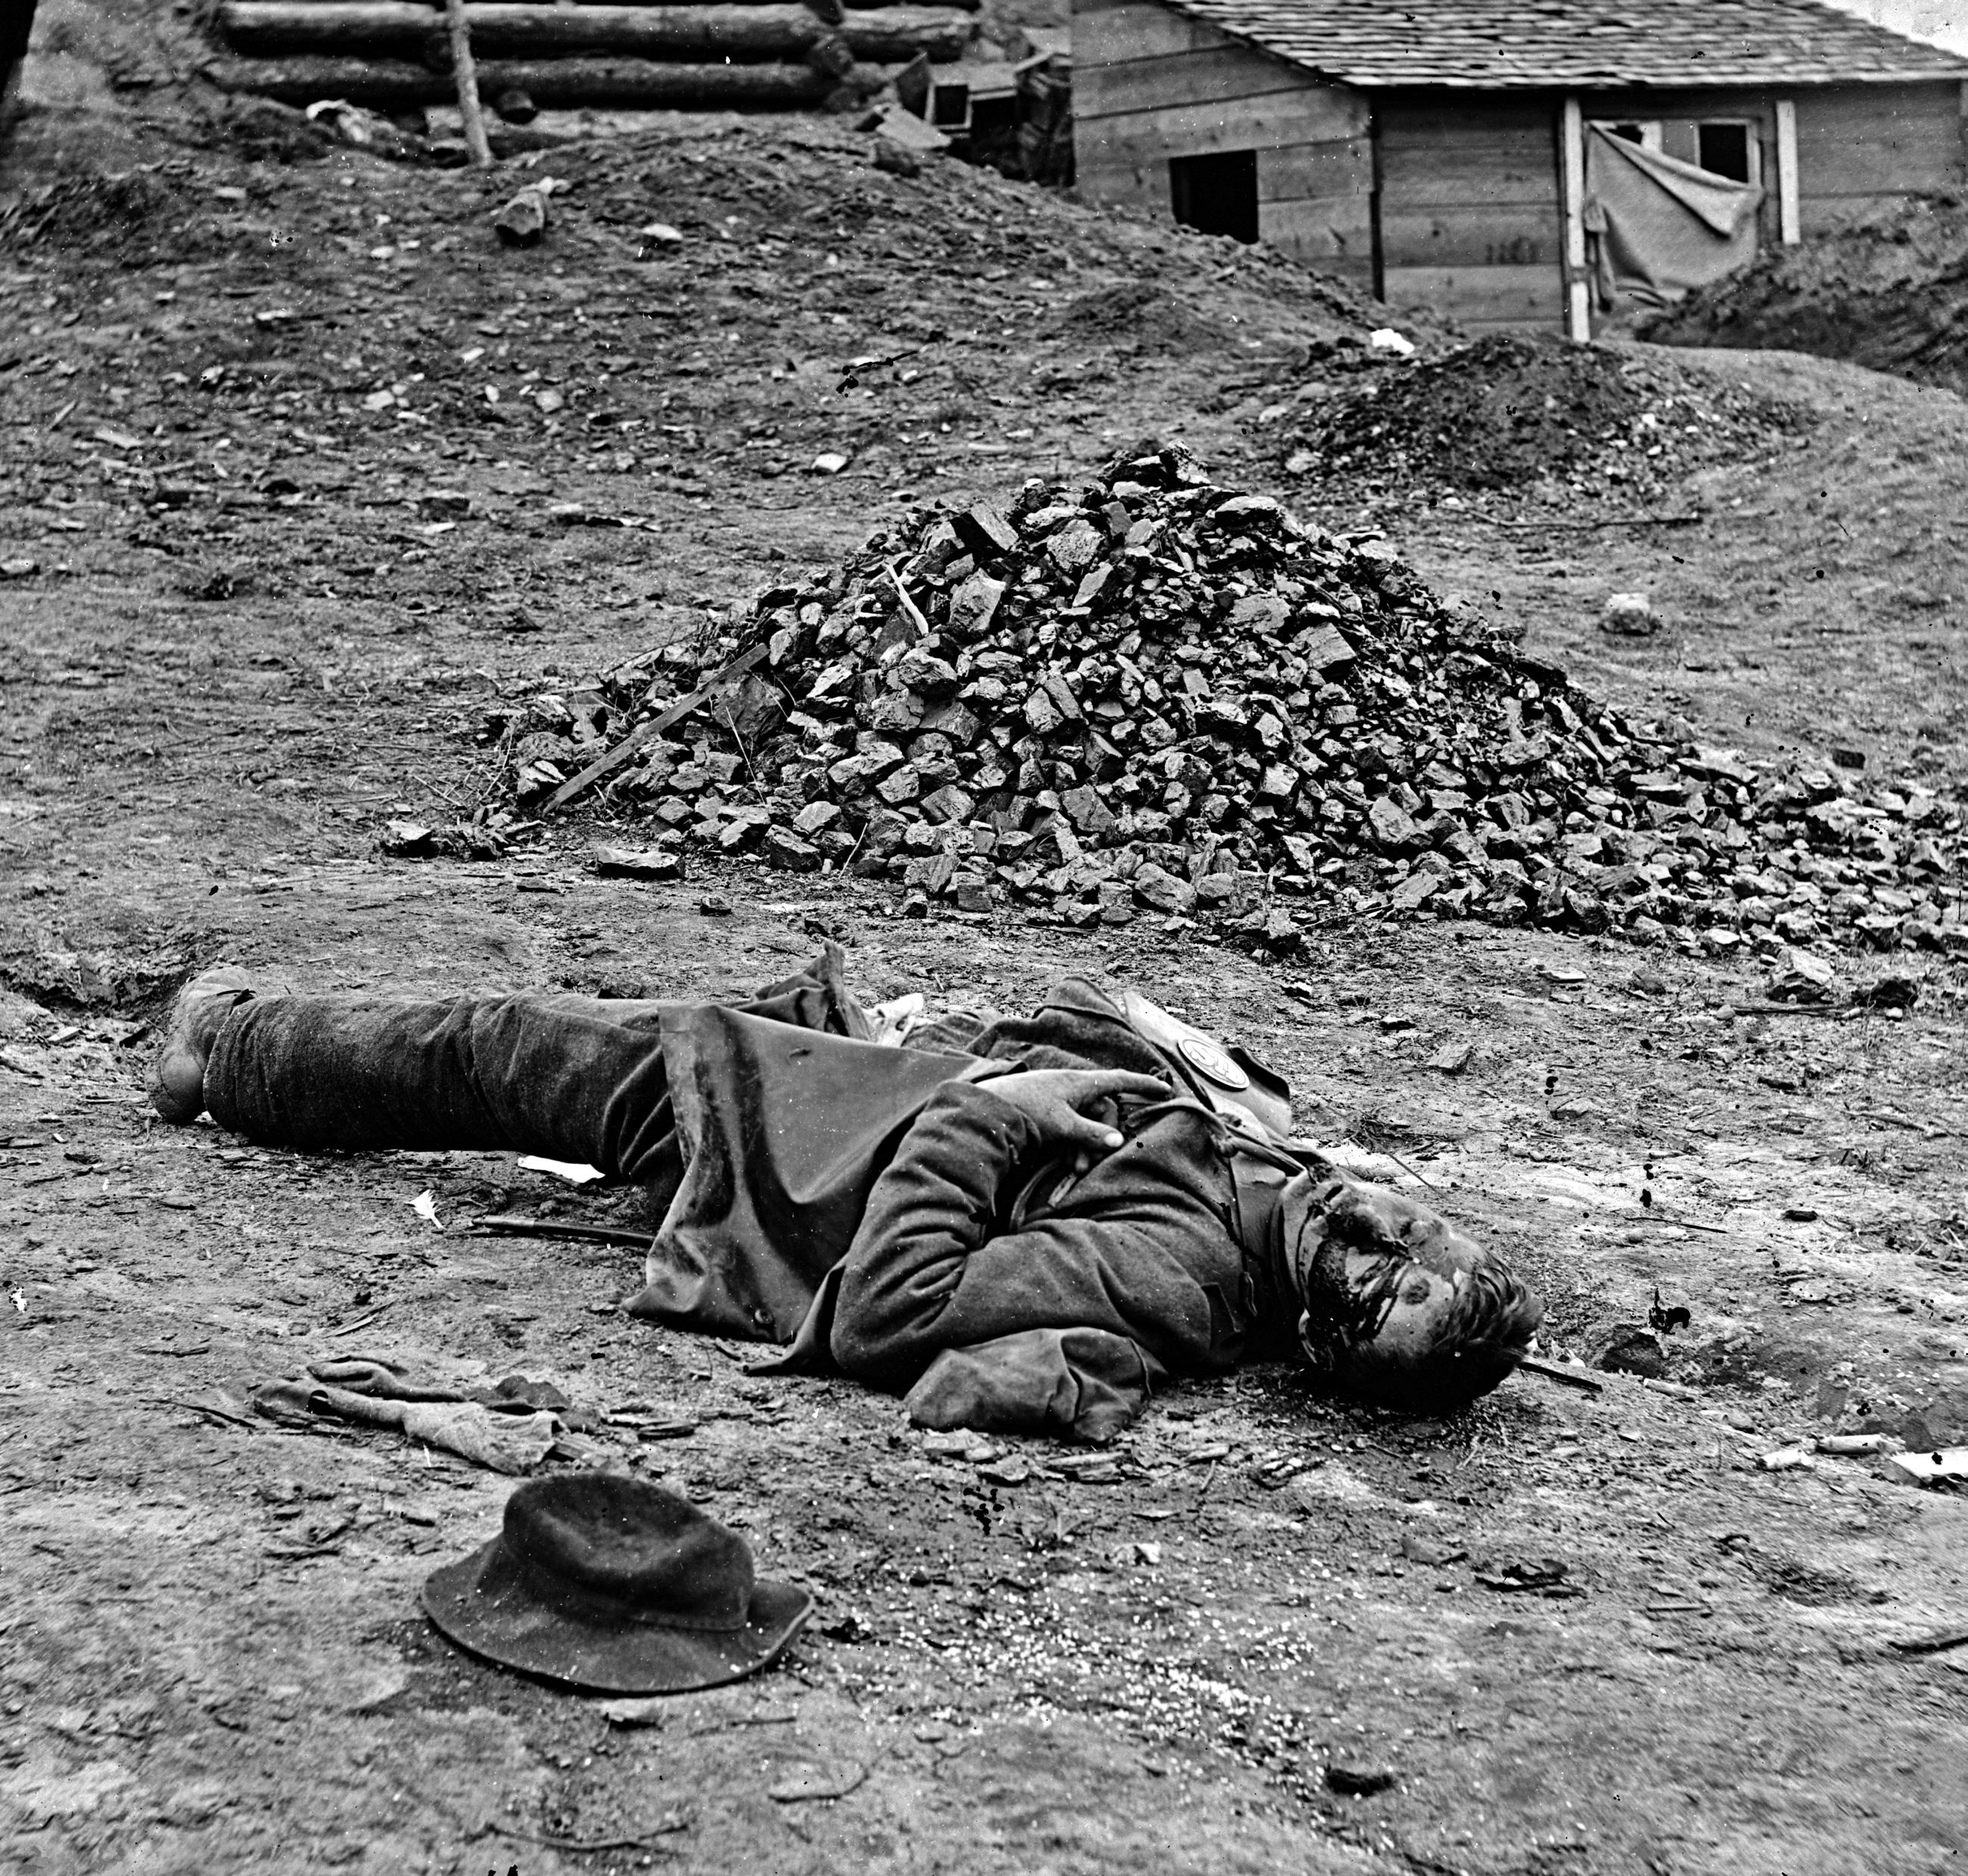 Dead soldier at Petersburg, Virginia, April 1, 1865.